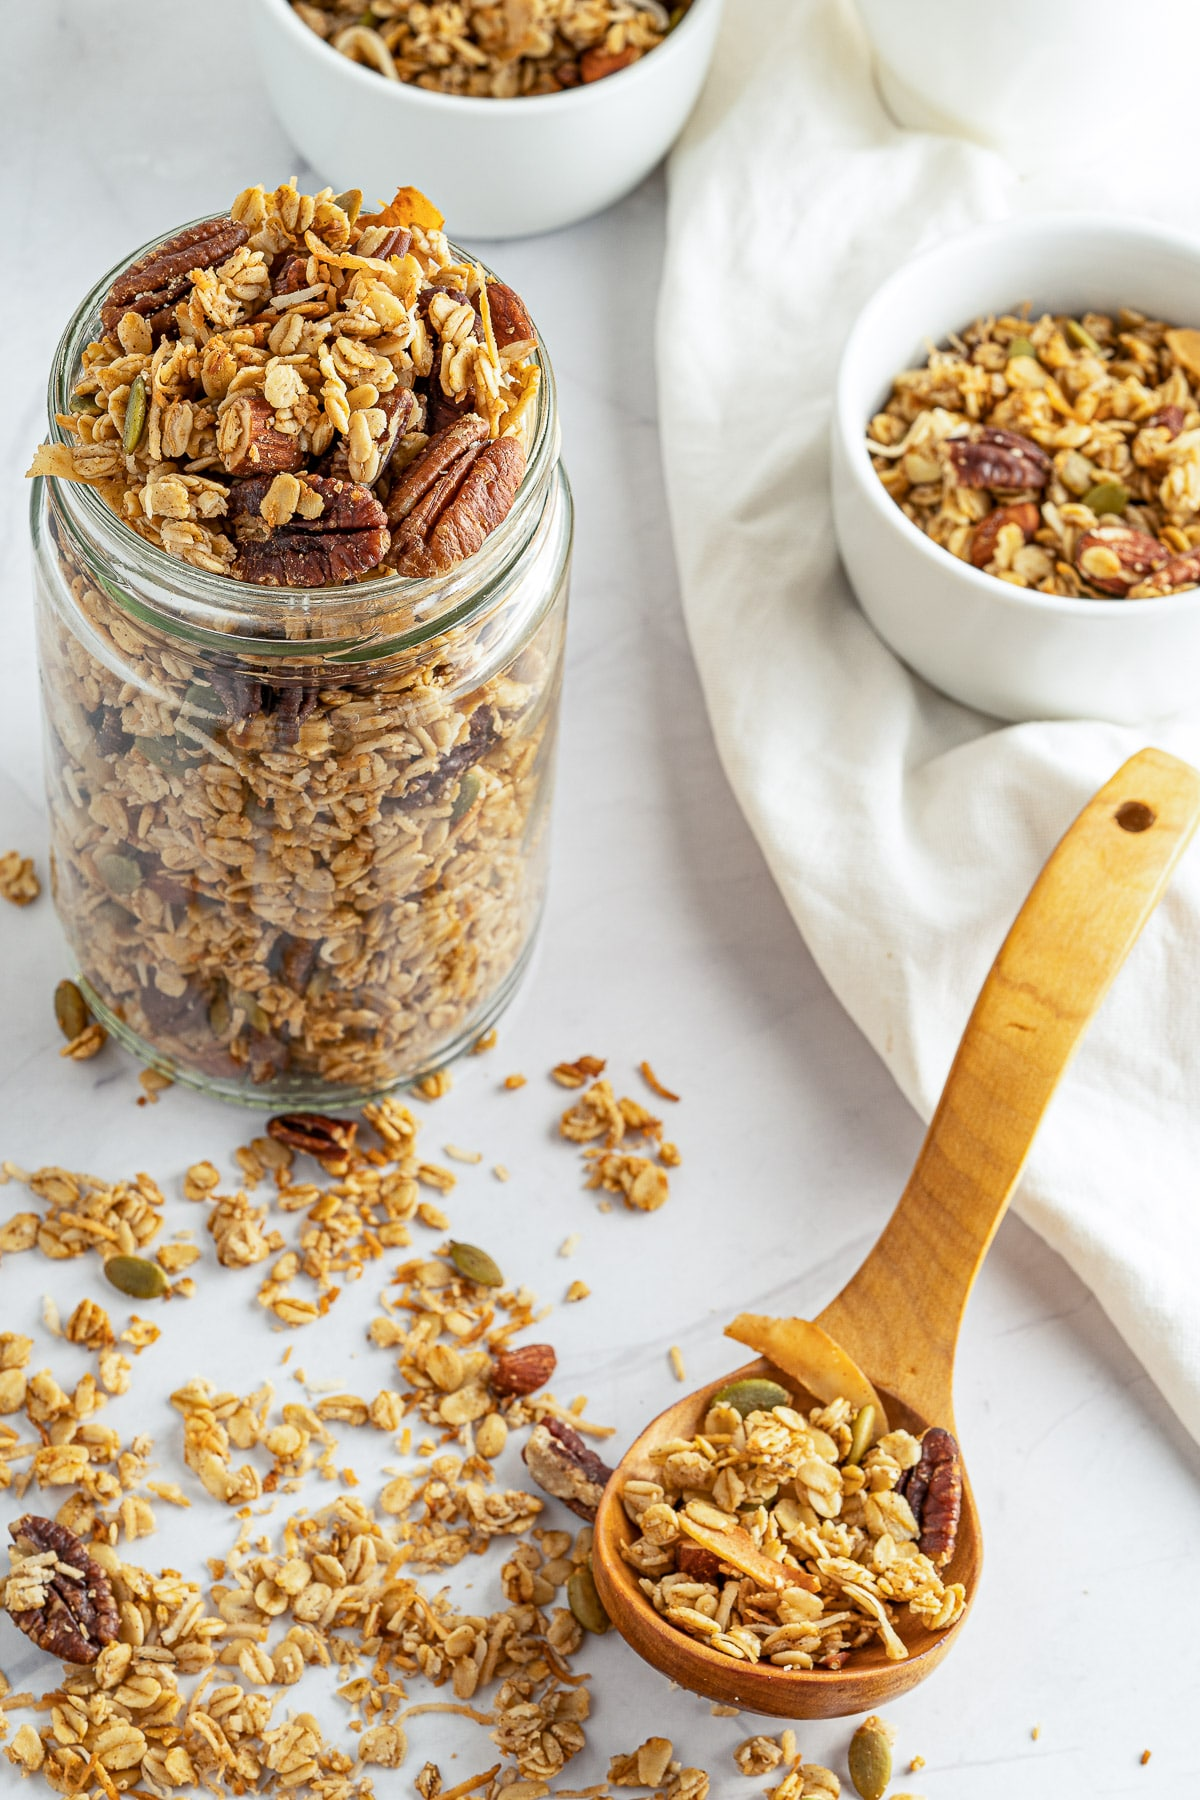 homemade granola jar overhead WITH SPOON